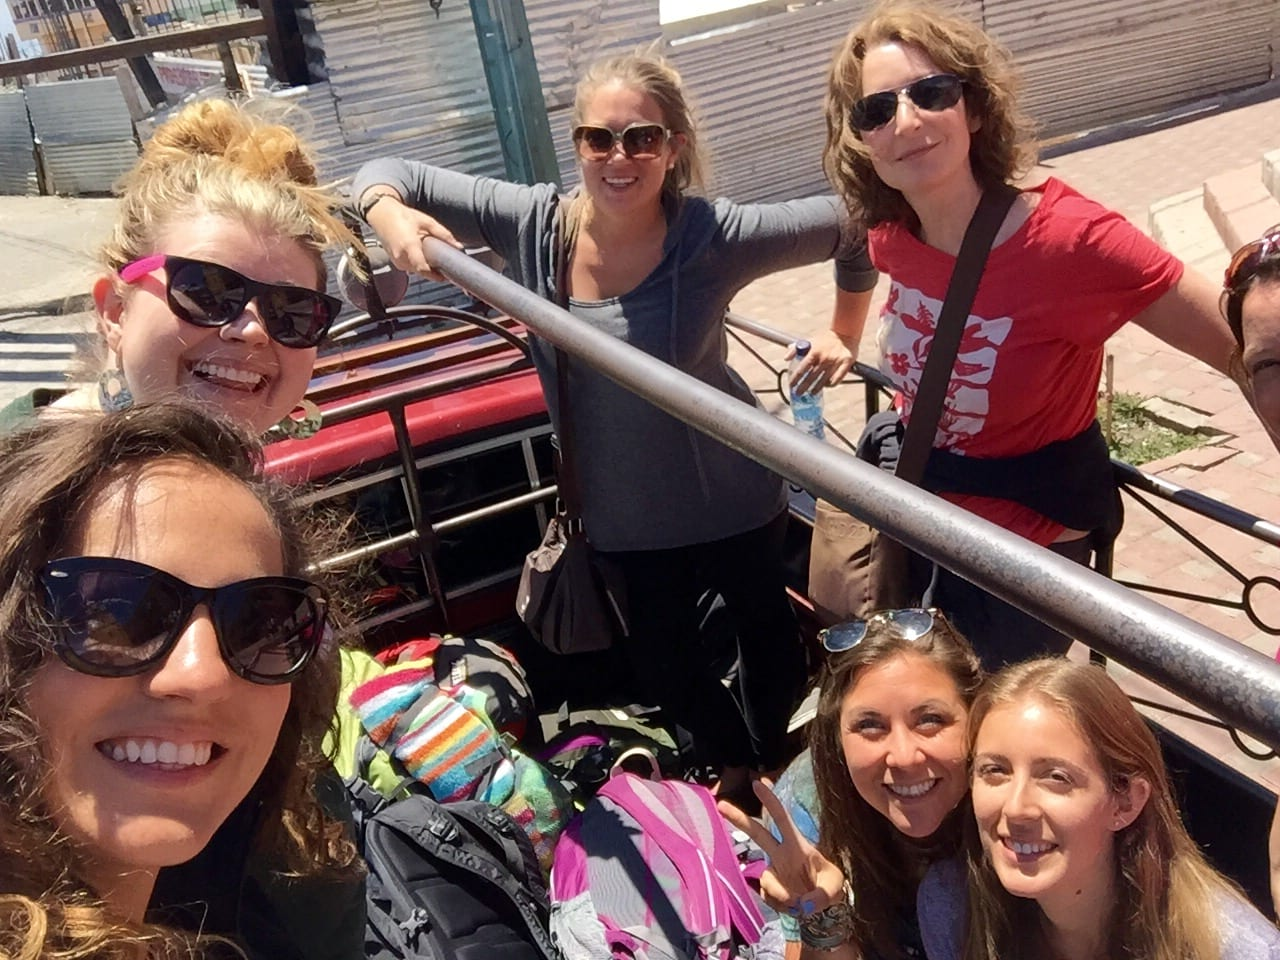 Girls in a Pickup Truck